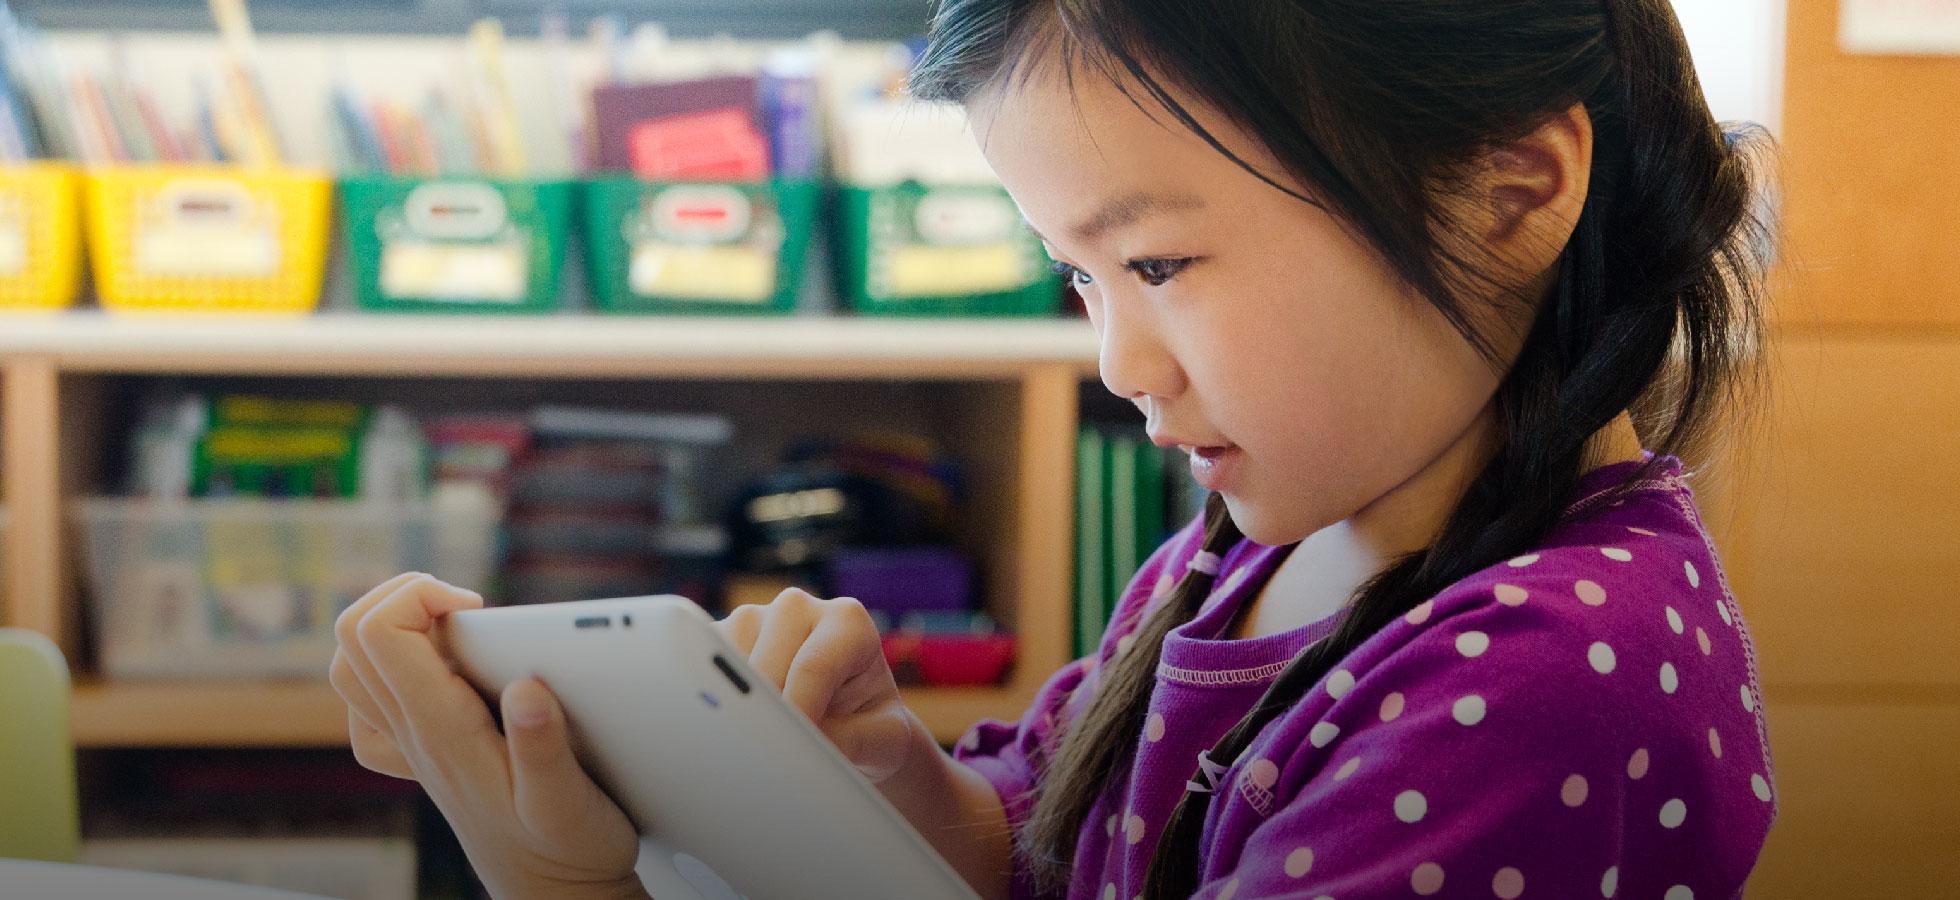 Criança com iPad